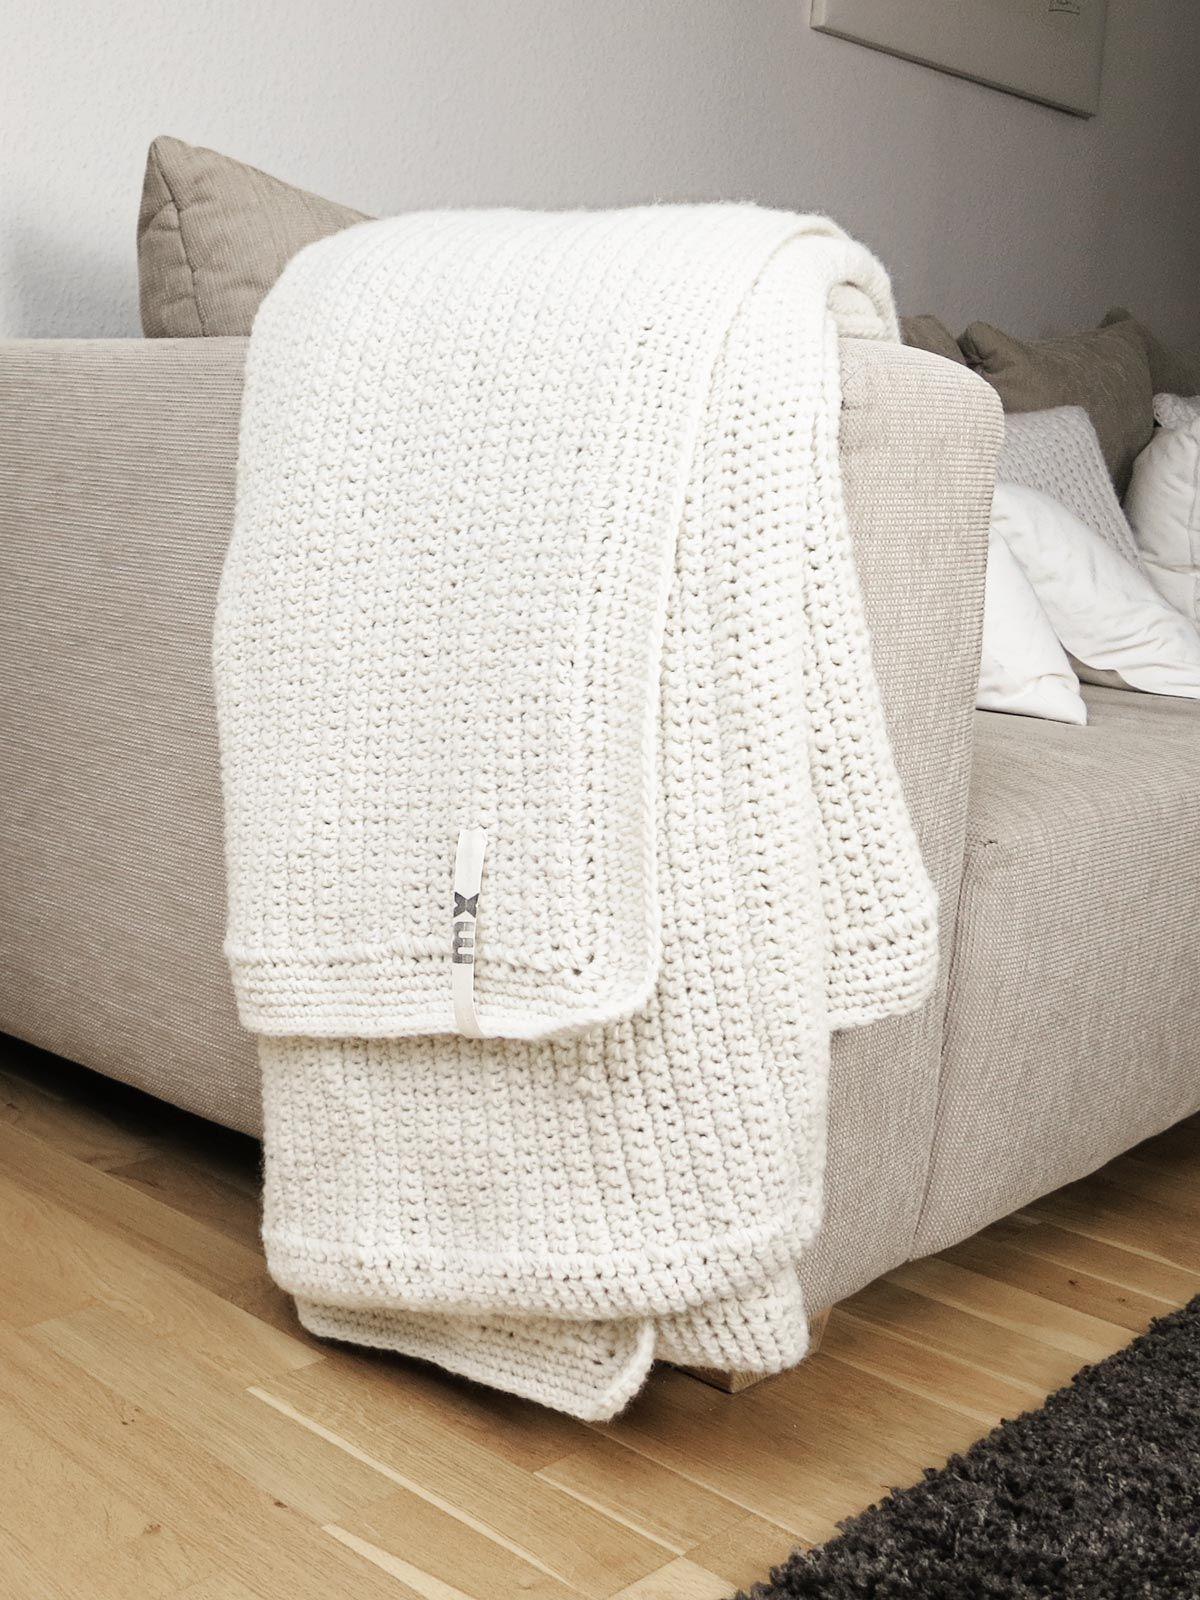 DIY | Crochet, Knit crochet and Blanket